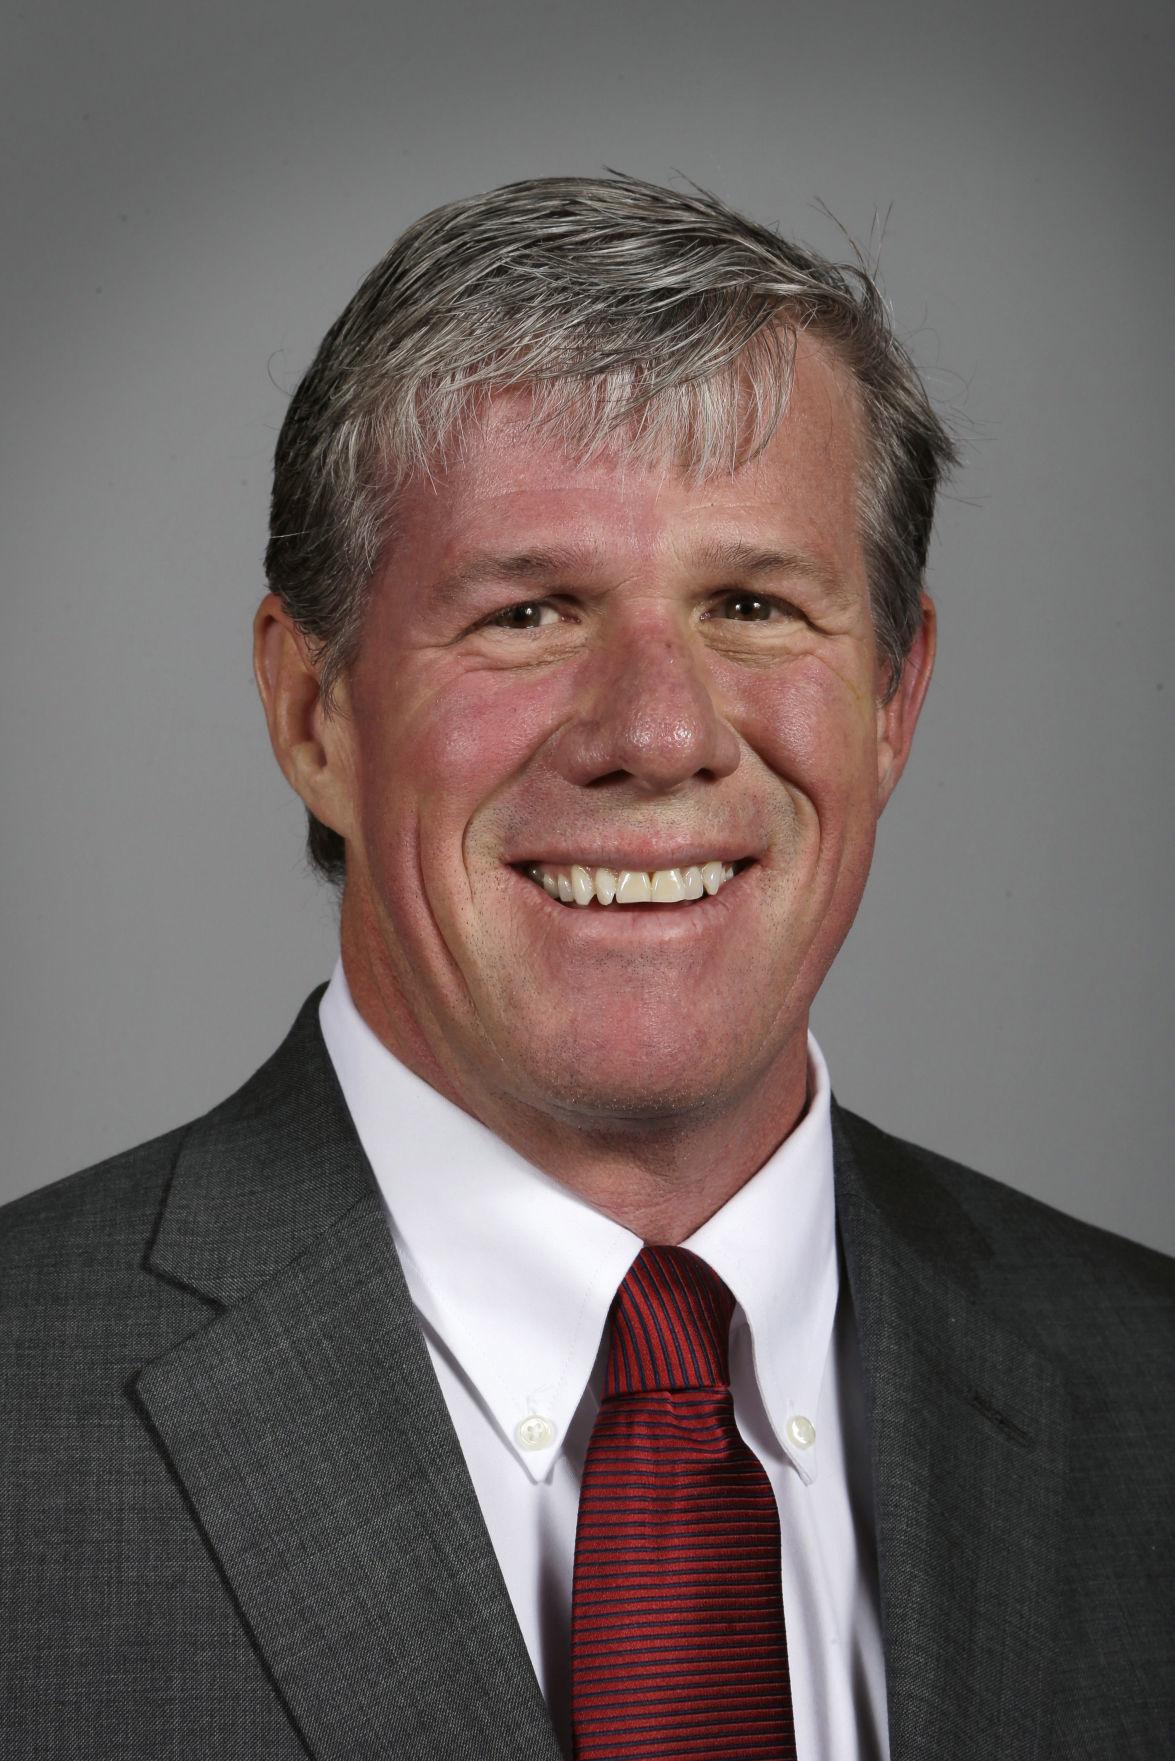 Iowa Senate Brad Zaun